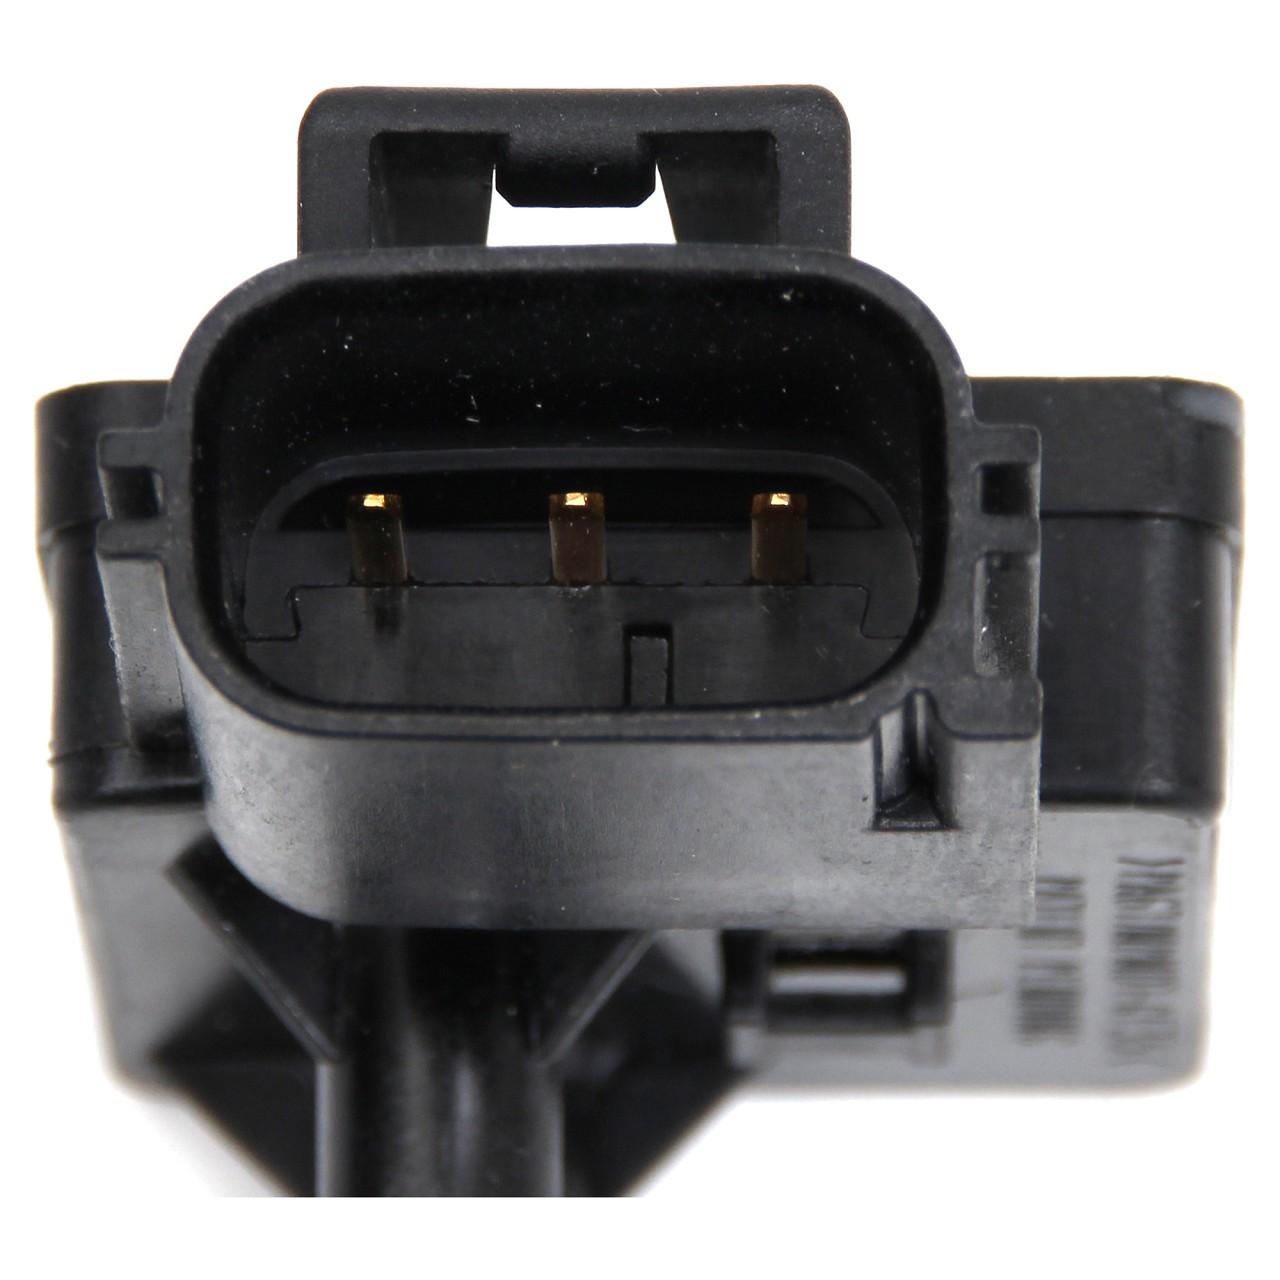 ORIGINAL Ford Abgasdrucksensor Differenzdruck Fiesta VI 1.4/1.6TDCi 1600077